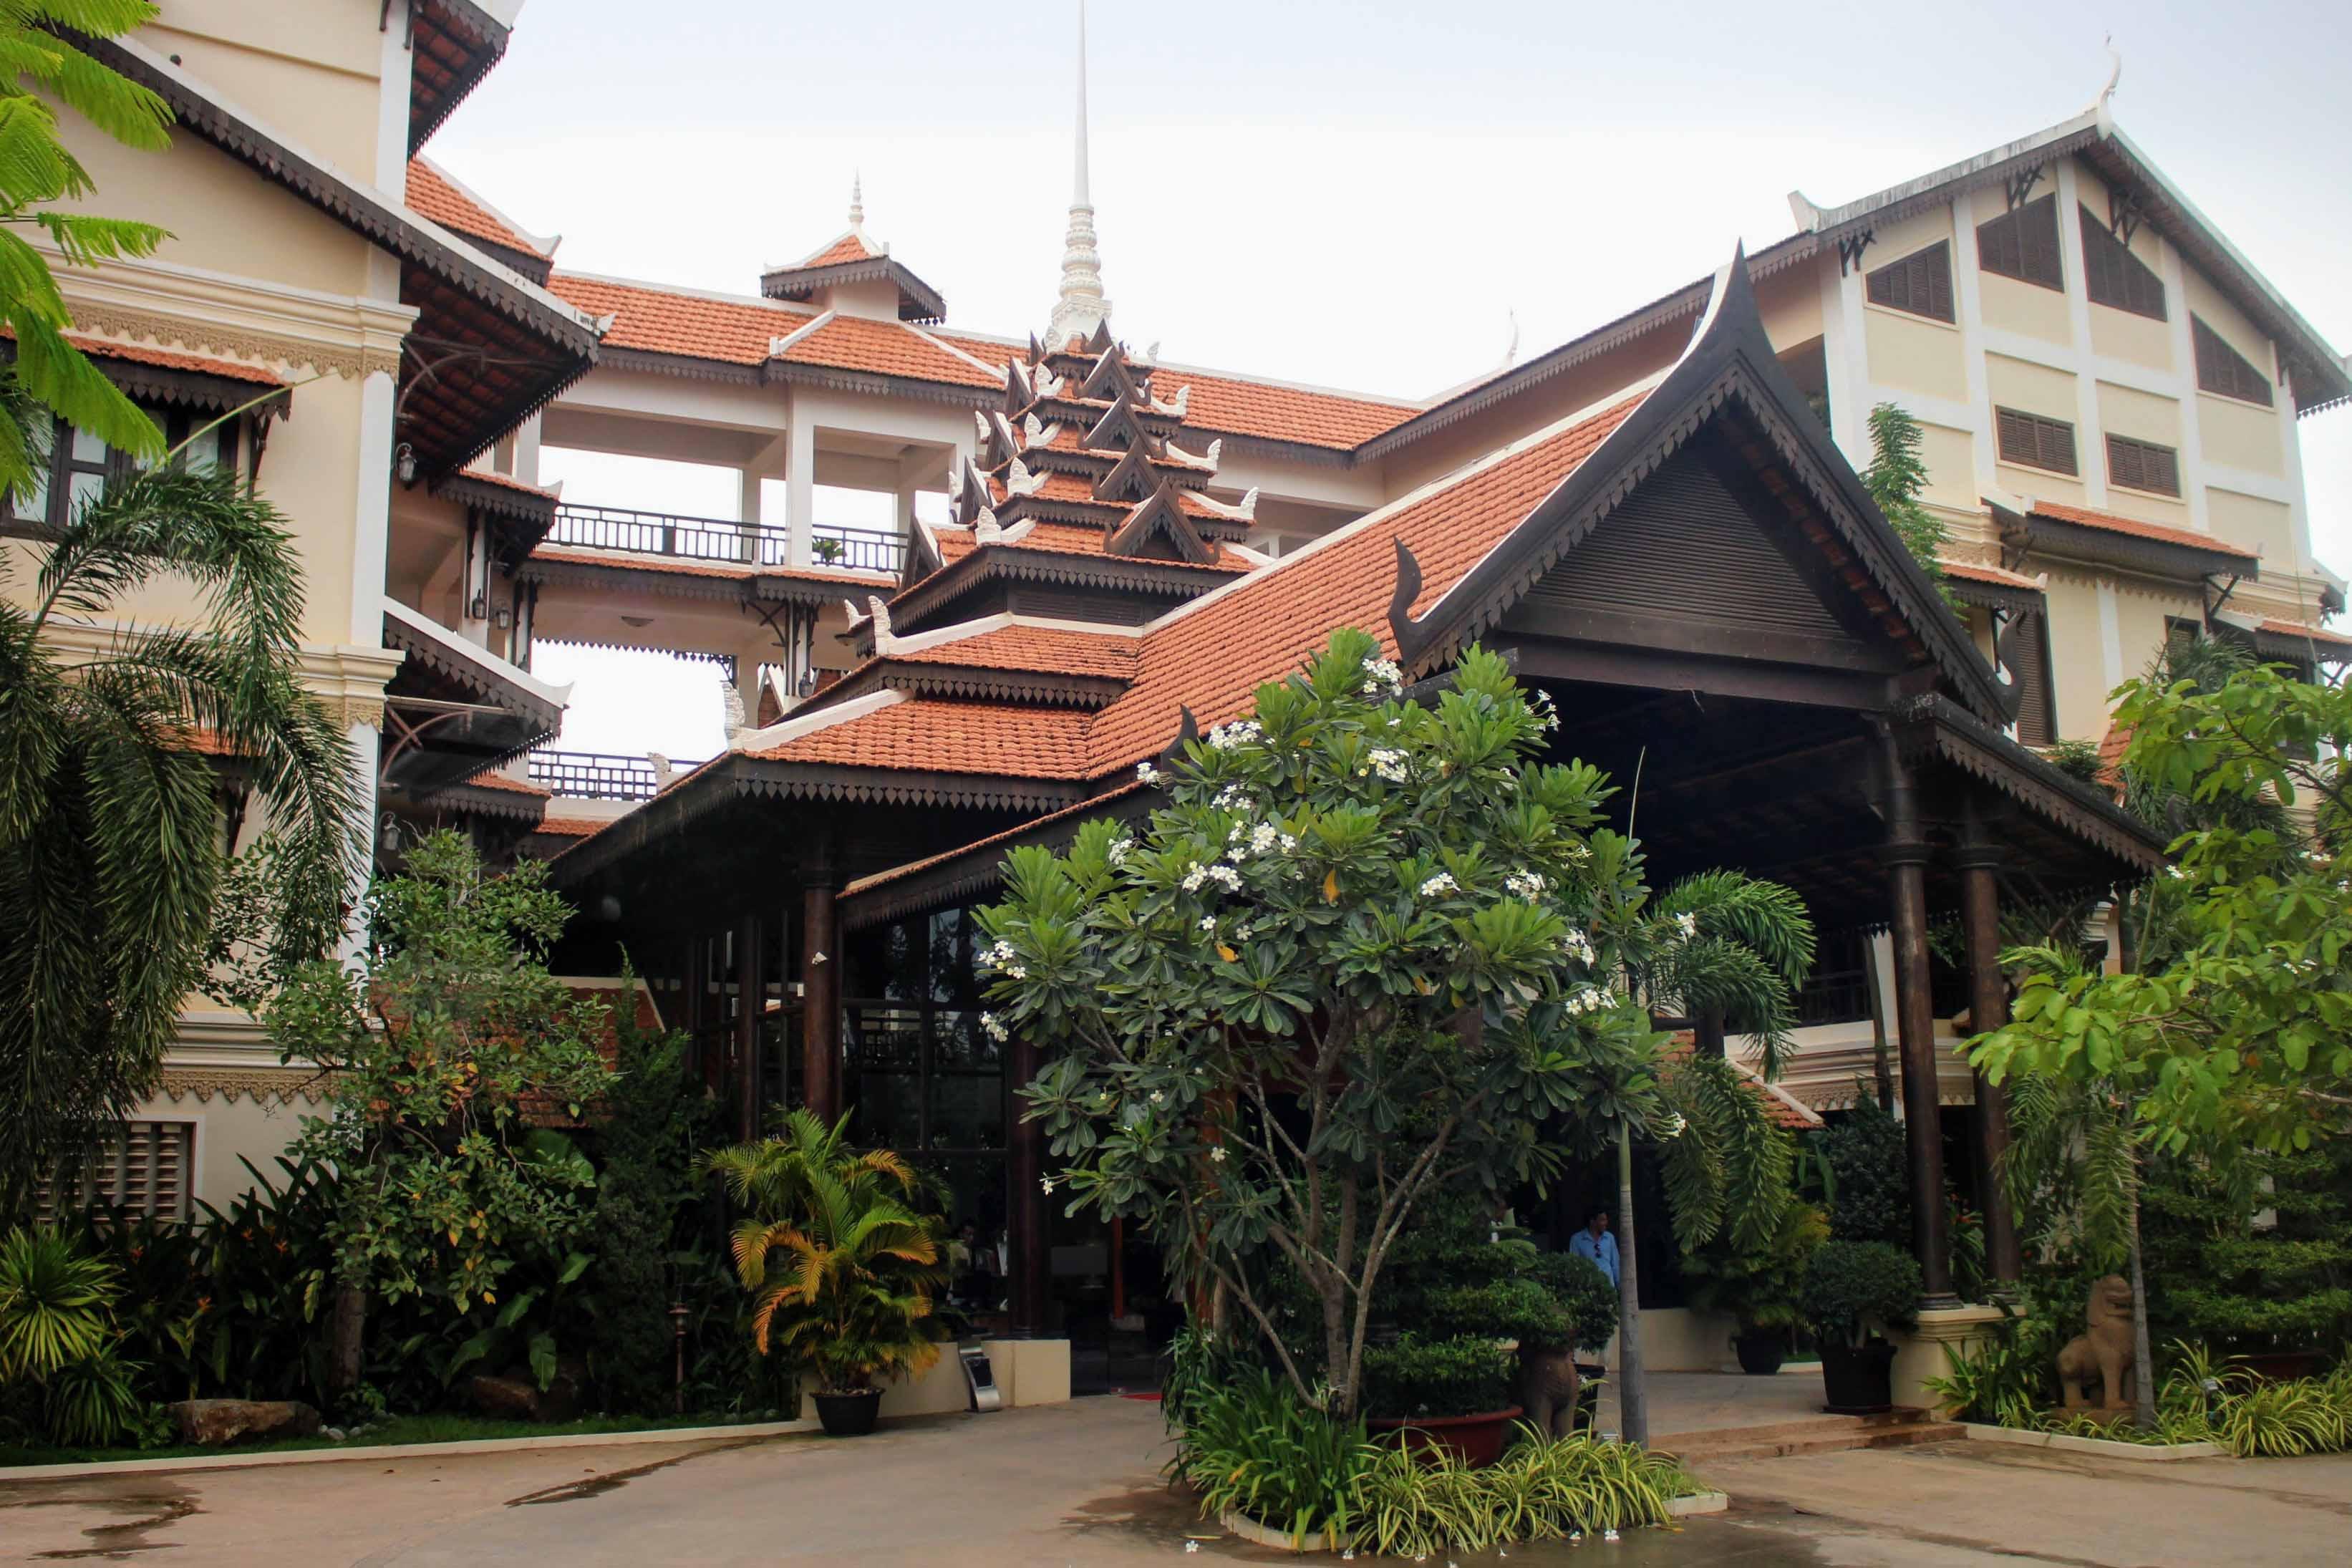 saem siemreap hotel, siem reap, cambodja, angkor